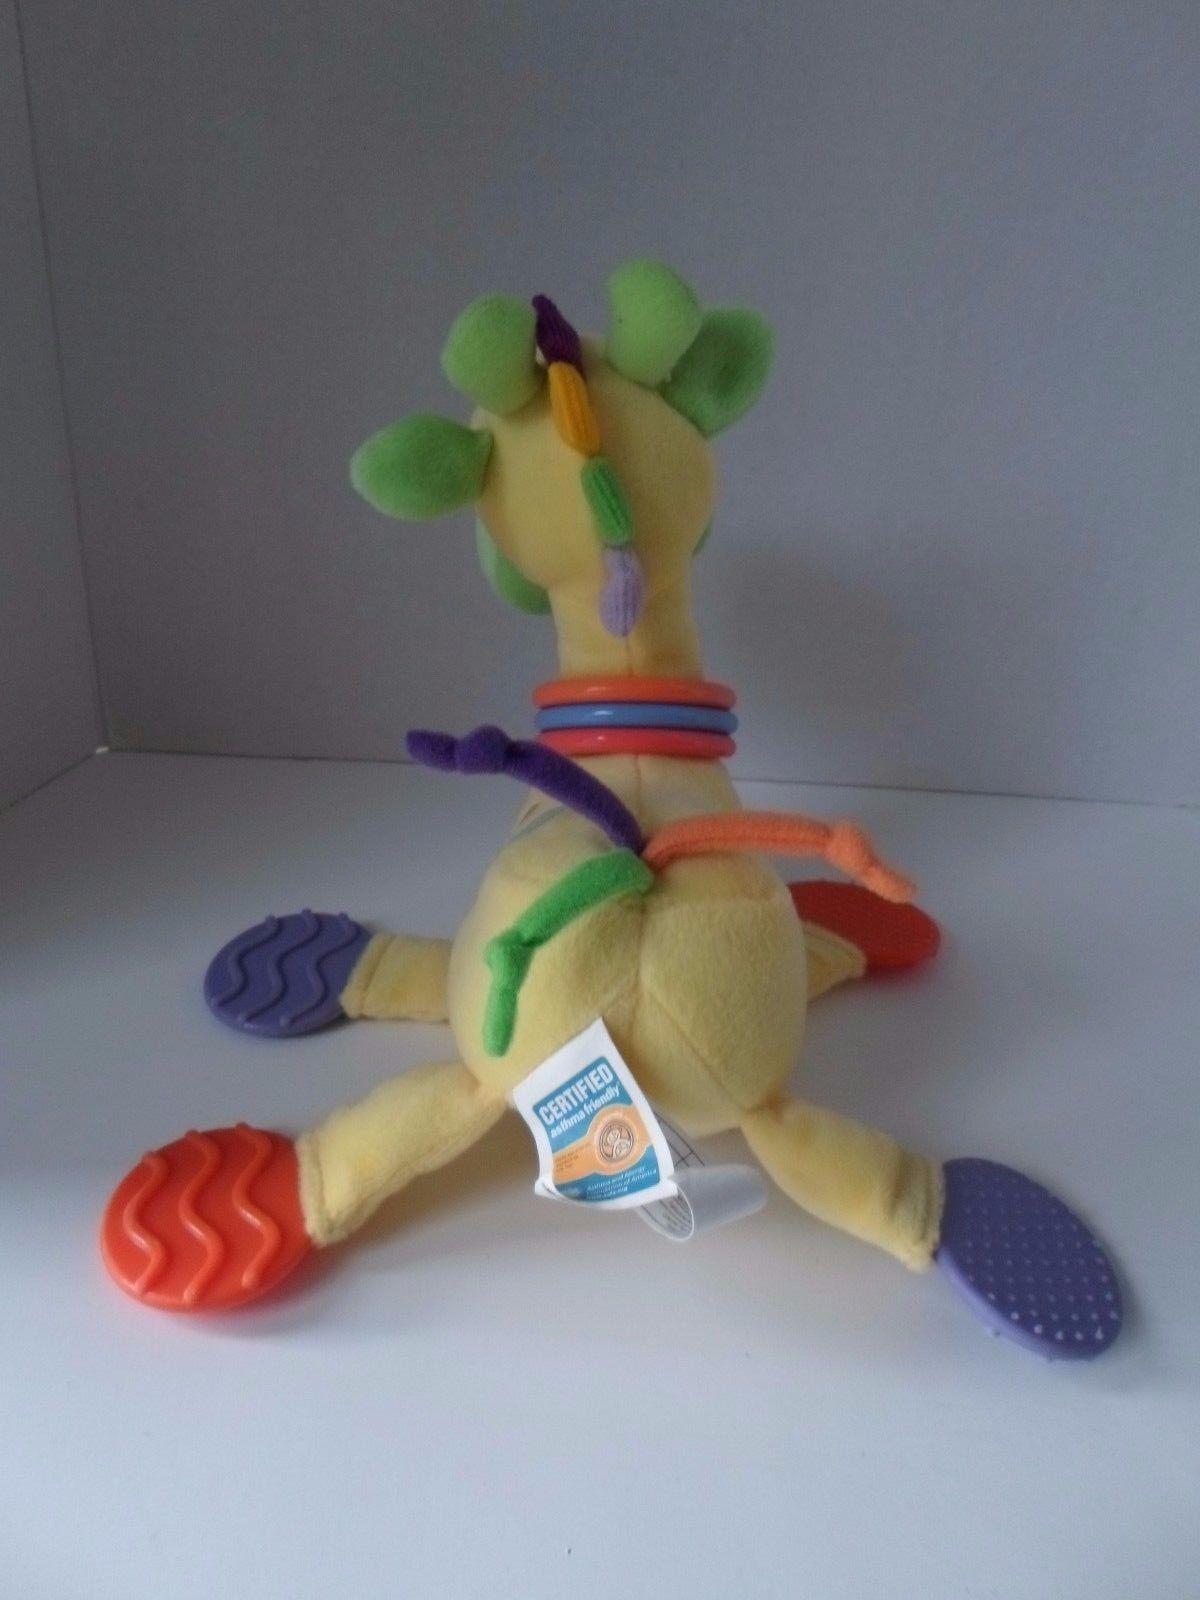 Kids Preferred Giraffe BABY Developmental Plush TOY Rattle Teether Mirror image 4